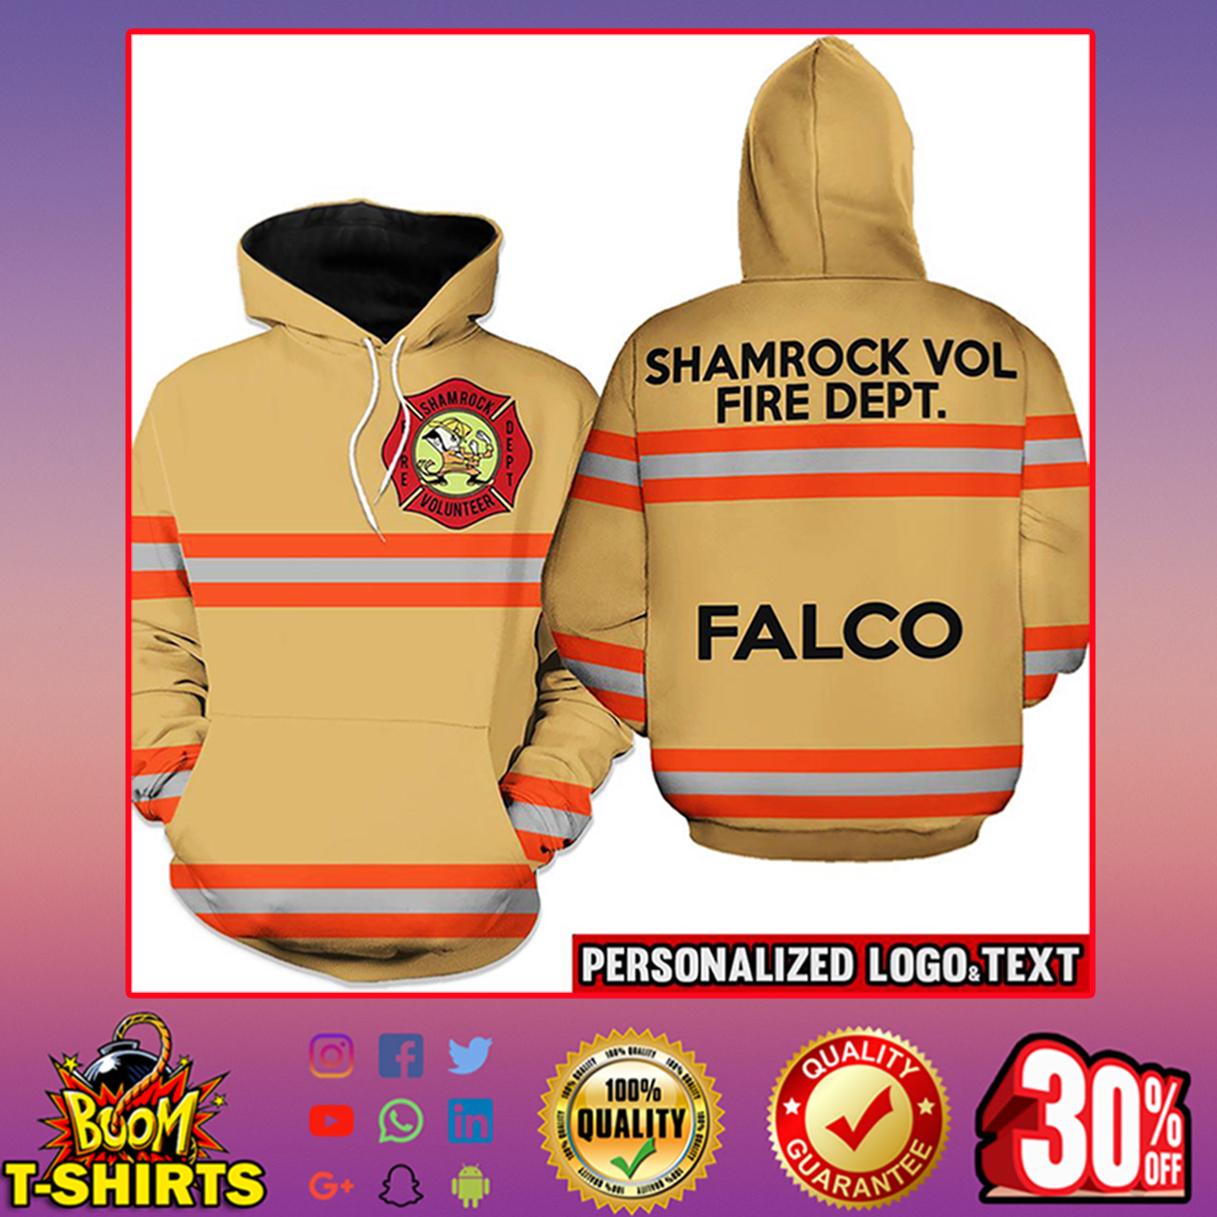 Firefighter Shamrock Volunteer Fire Dept. Falco Hoodie 3d - orange line - brown